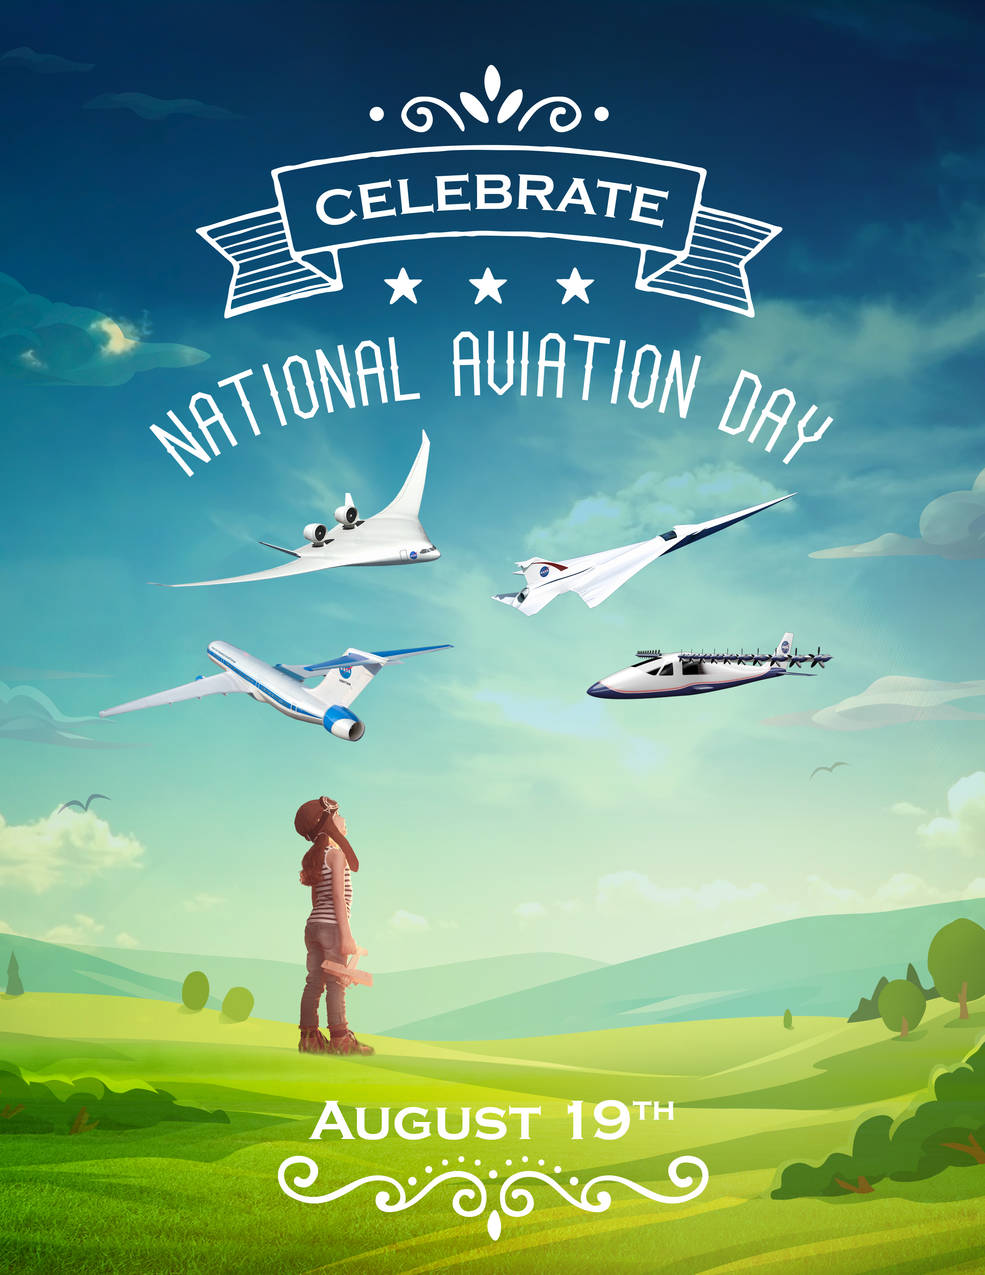 NASAの「飛行機の日」のポスター